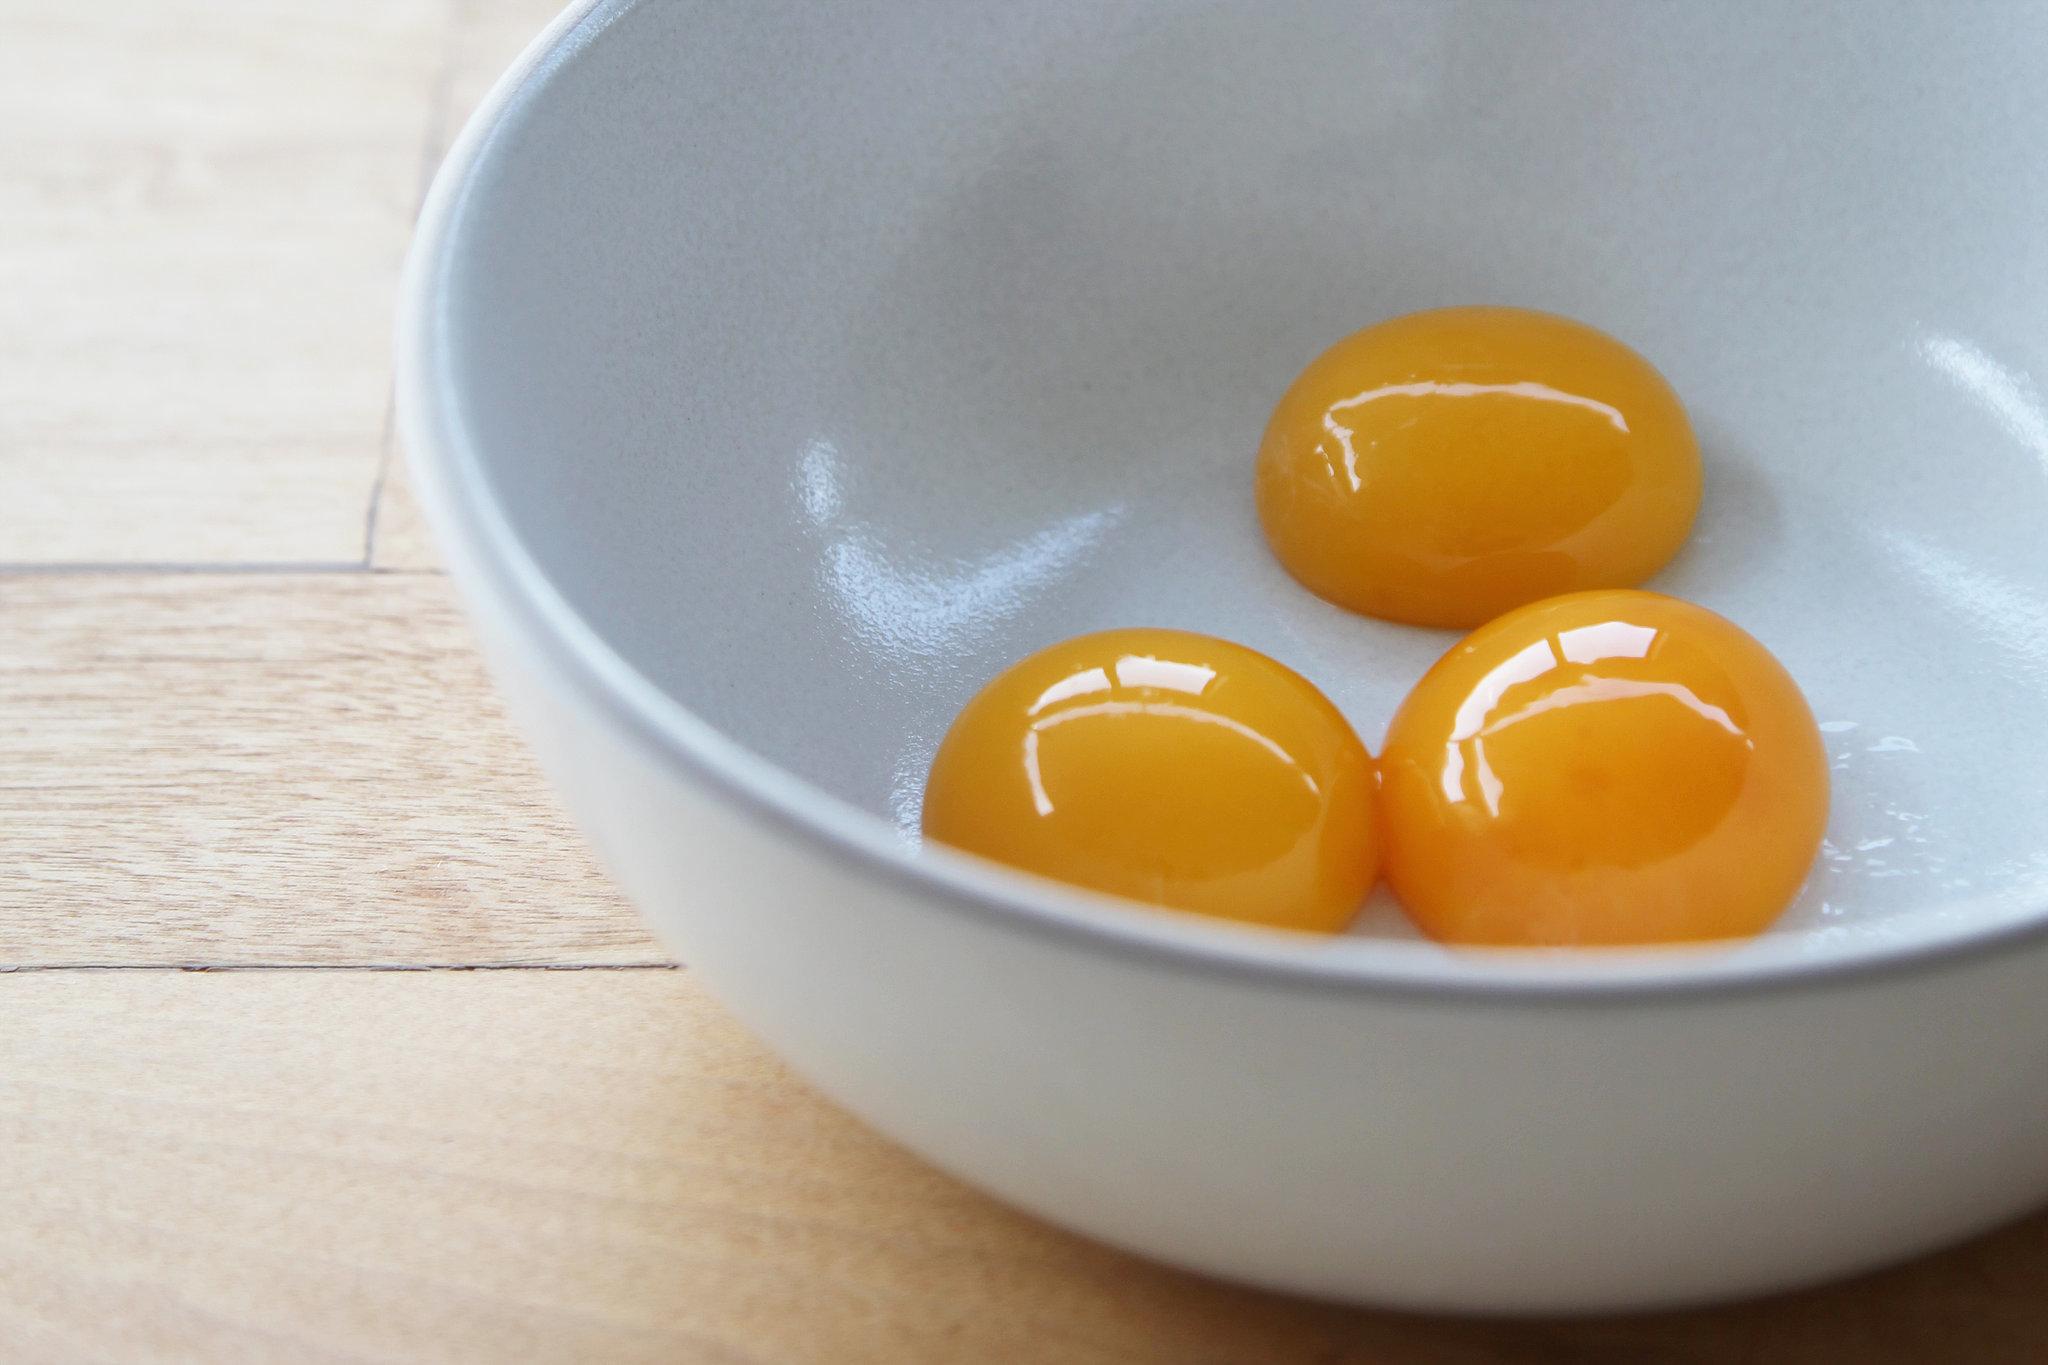 077fa881_Egg-Yolks-2.xxxlarge_2x_ Egg_ Organic_Health